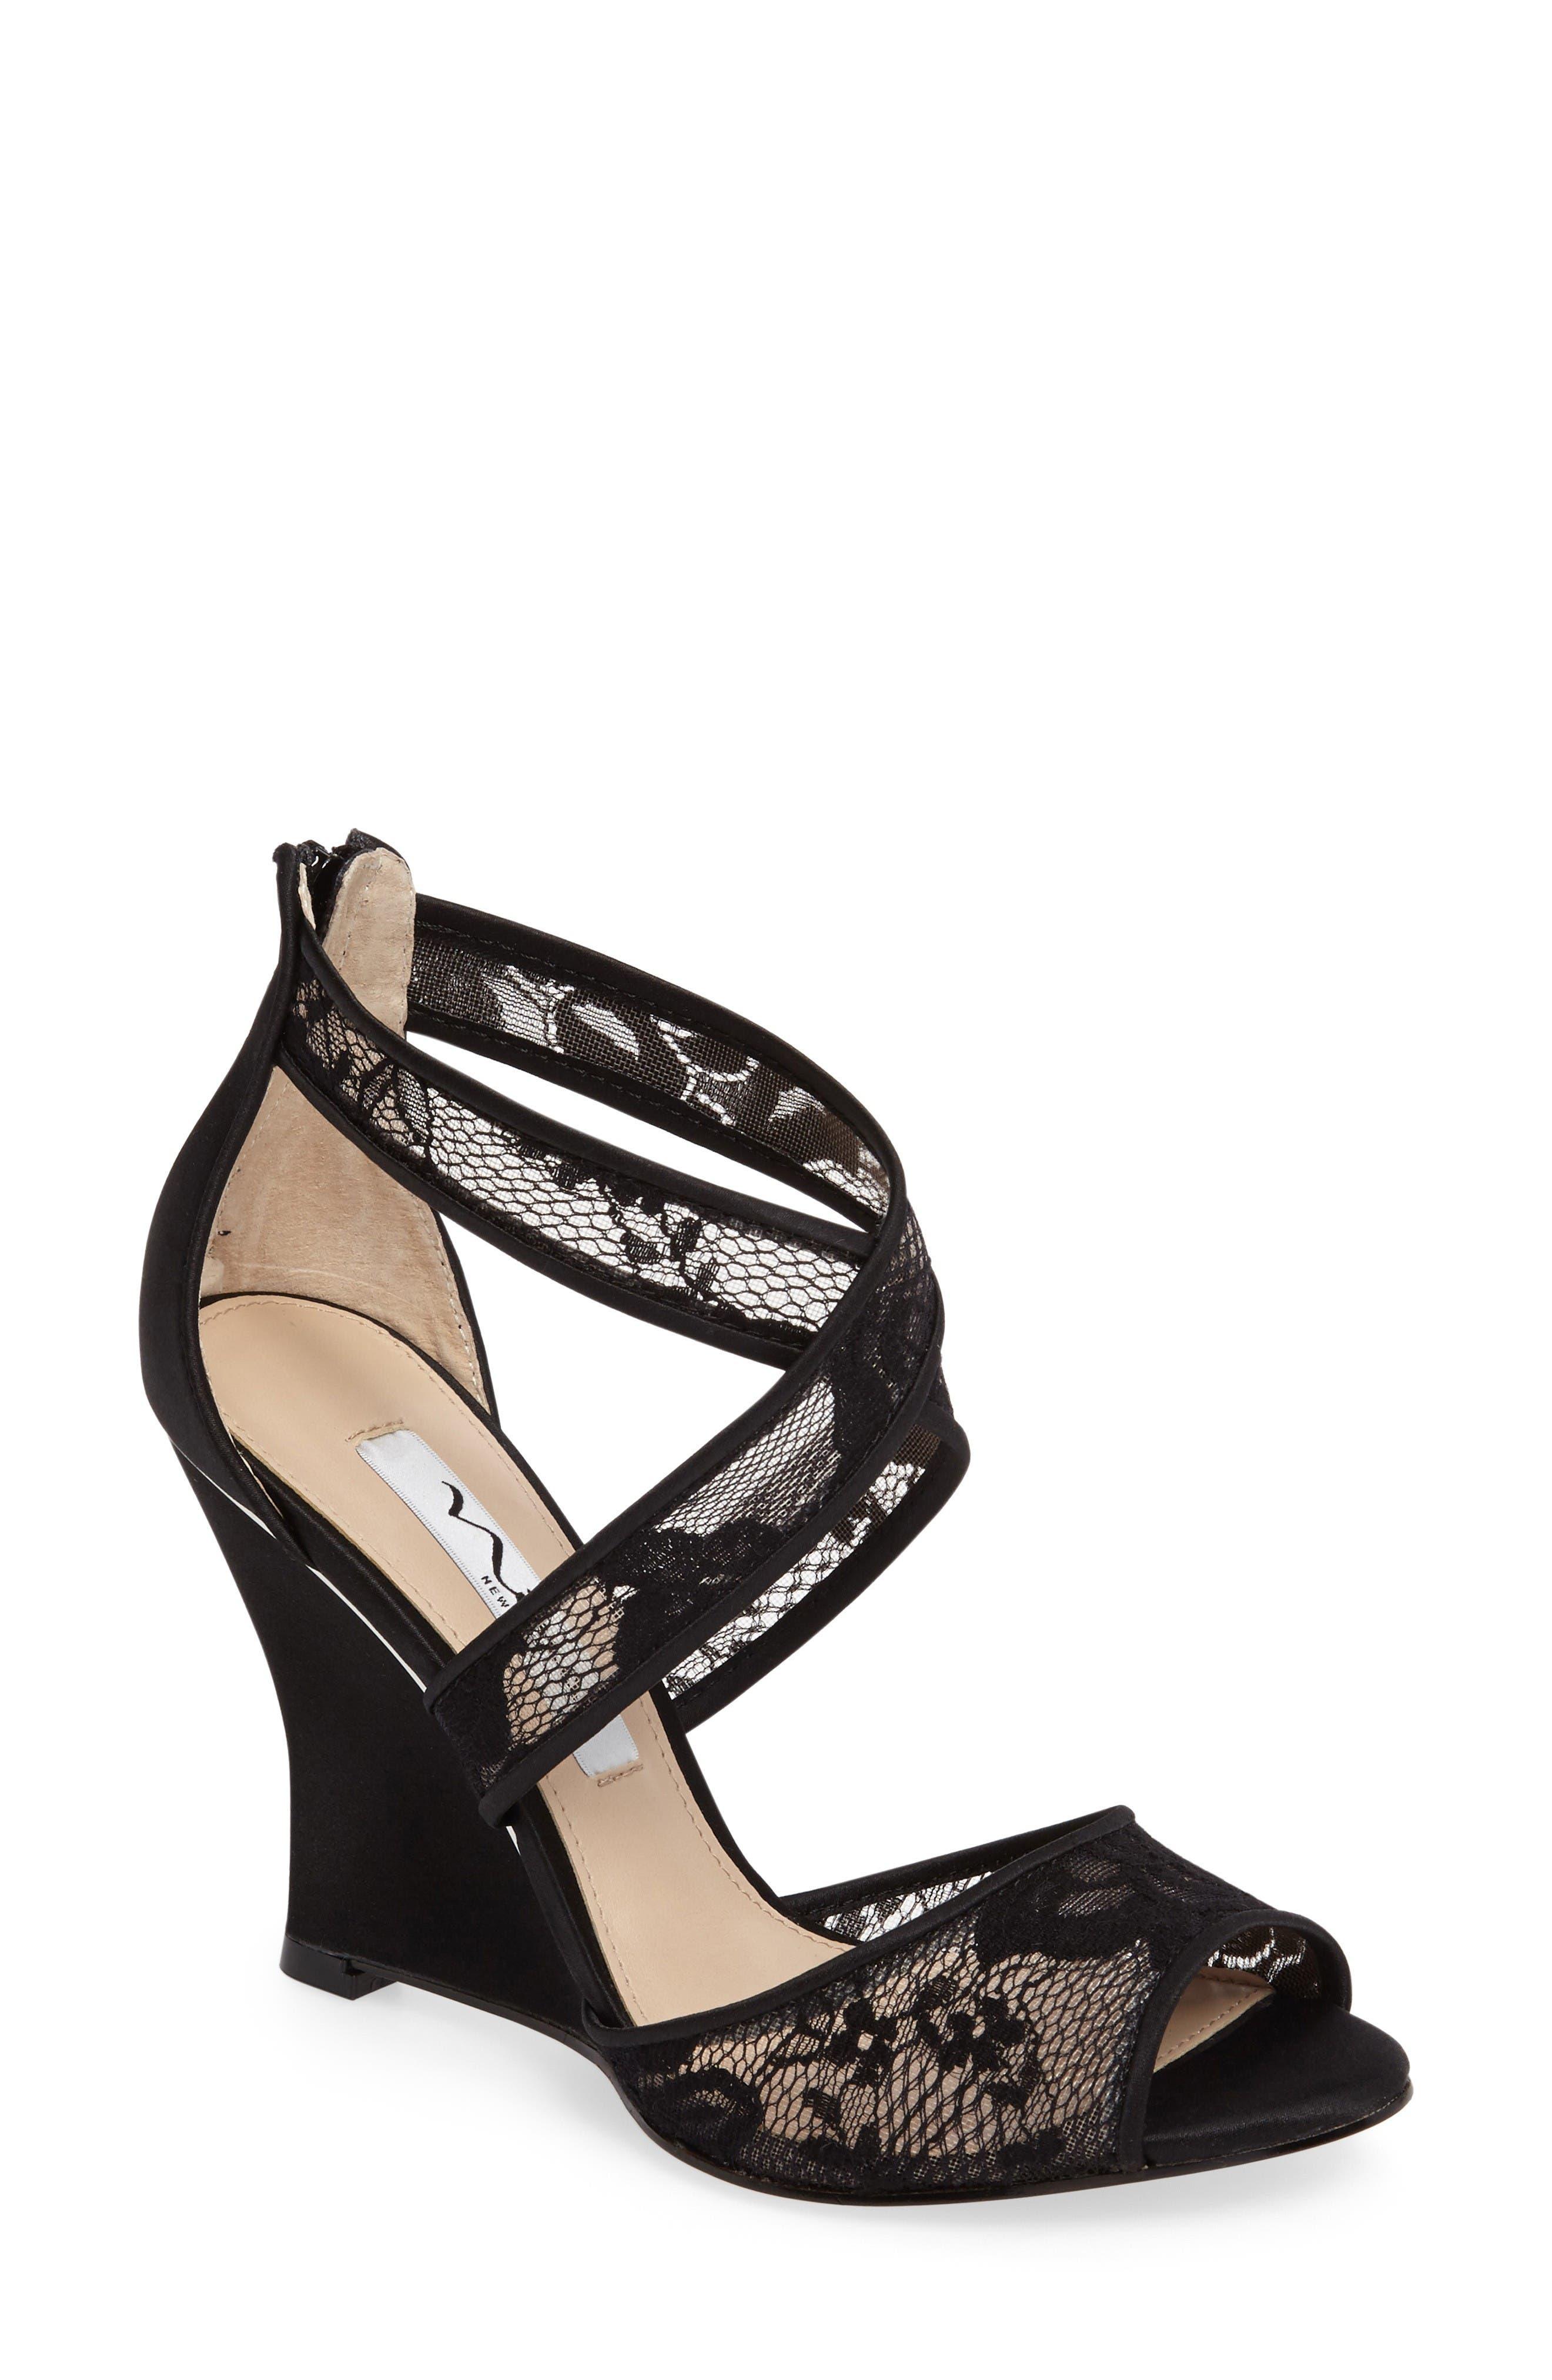 Alternate Image 1 Selected - Nina Elyana Strappy Wedge Sandal (Women)